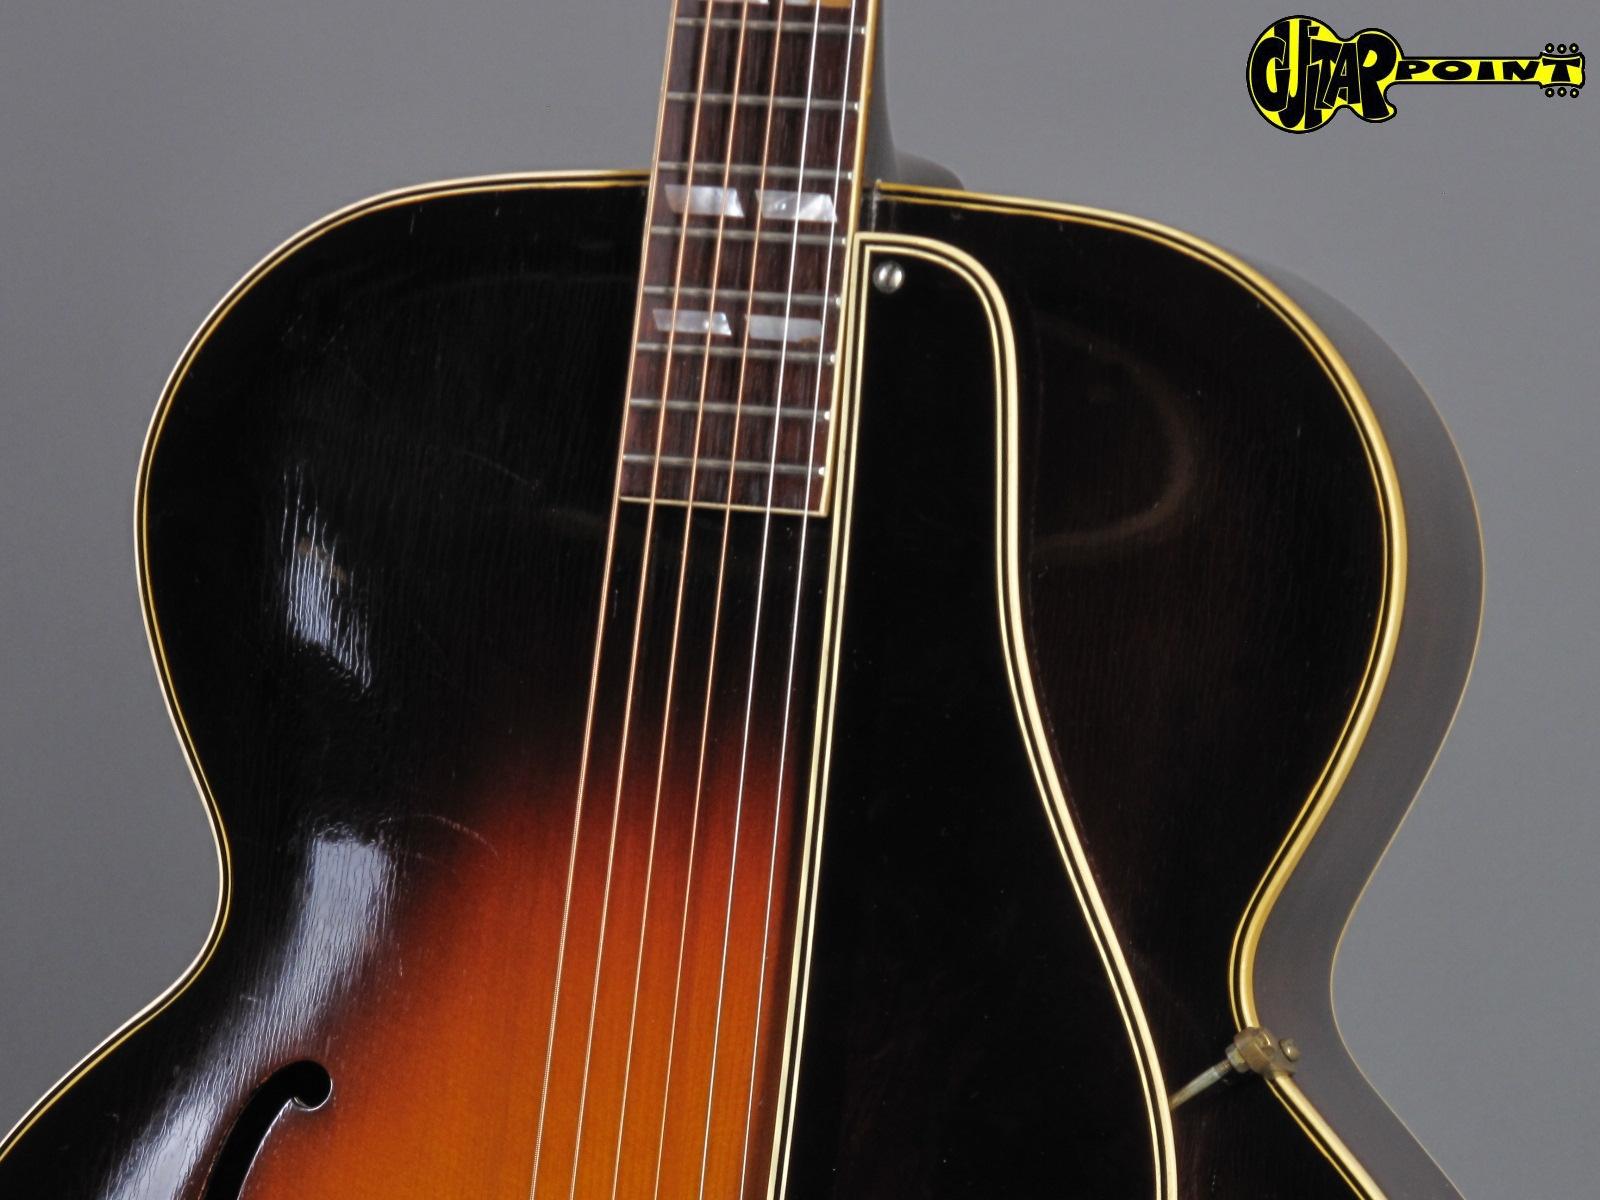 https://guitarpoint.de/app/uploads/products/1939-gibson-l-12-sunburst-incl-tweed-hardshell-case/Gibson39L12SB_94247_5.jpg